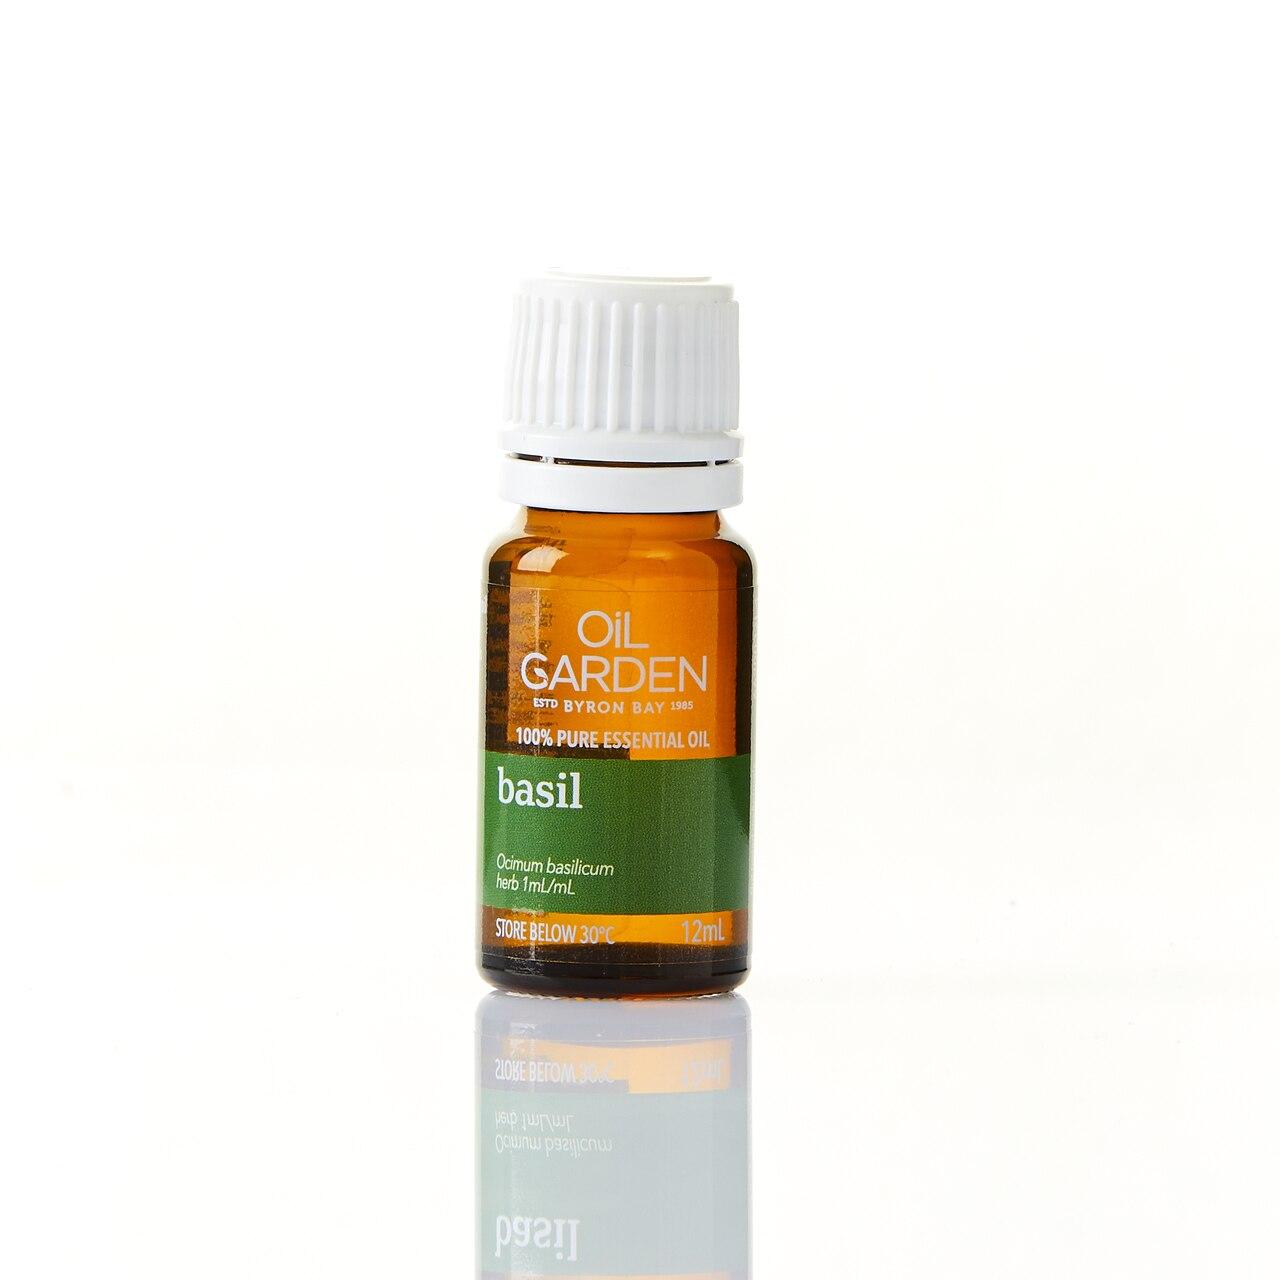 Oil Garden Basil Pure Essential Oil 12mL 6620032